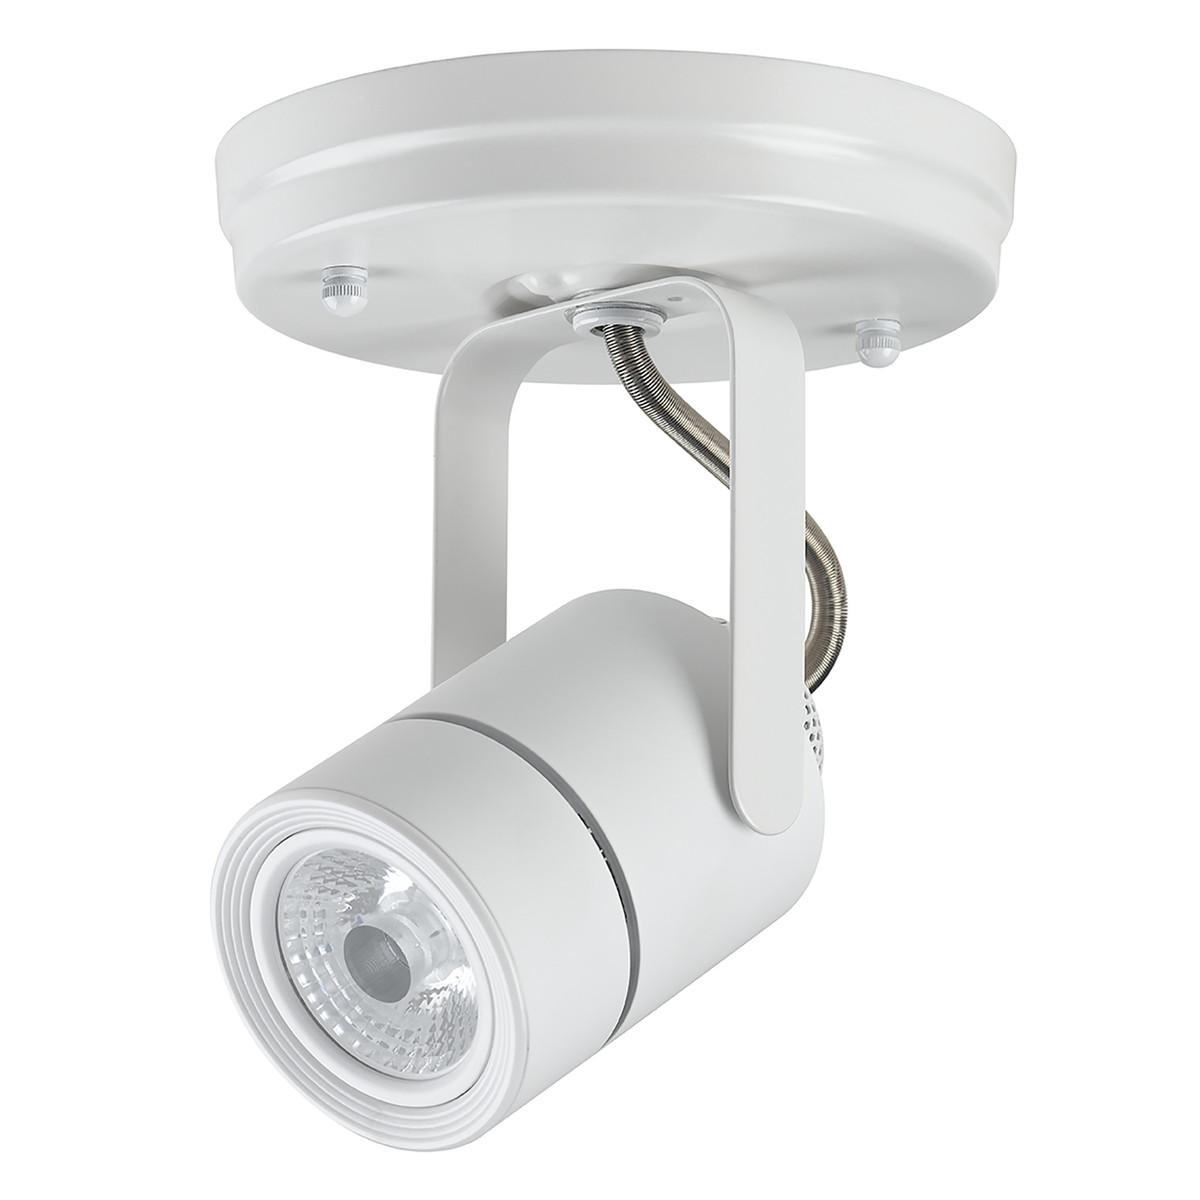 led track light canopy 10 watt 50w equiv 450 lumens maximus lighting